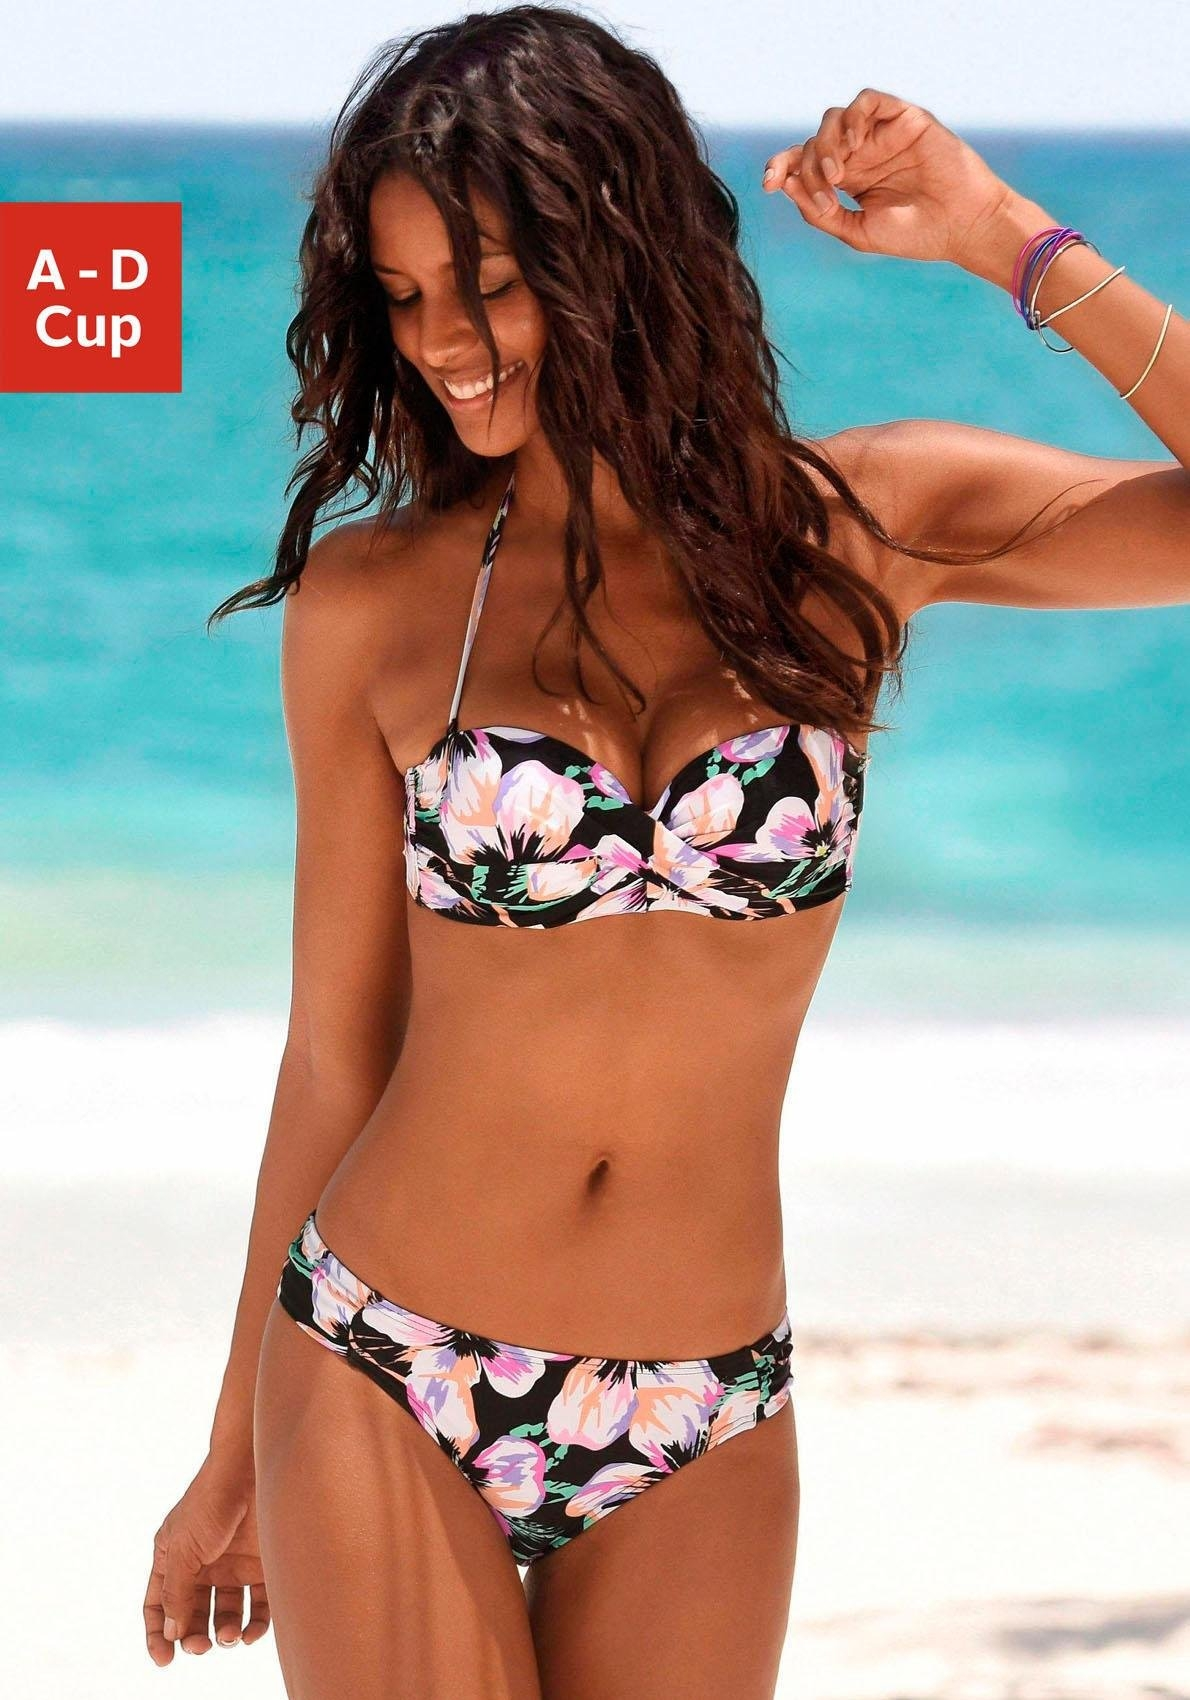 S.oliver Red Label beachwear beugelbikini in bandeaumodel - verschillende betaalmethodes